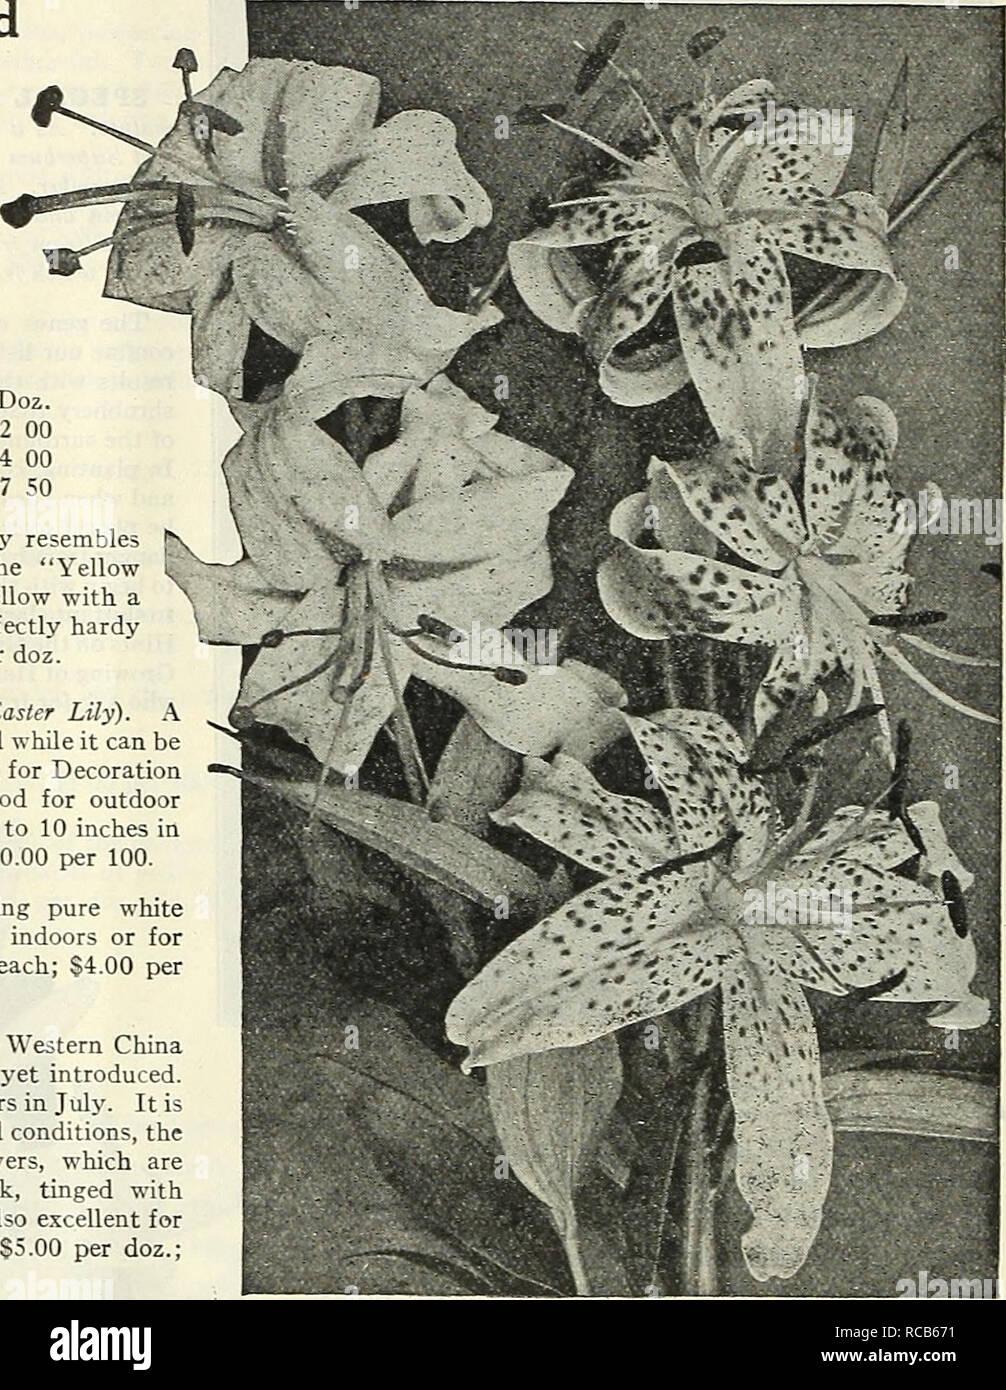 10 Triumphator Longiflorum Lily Purple /& White Flower Fragrant Summer Bulbs